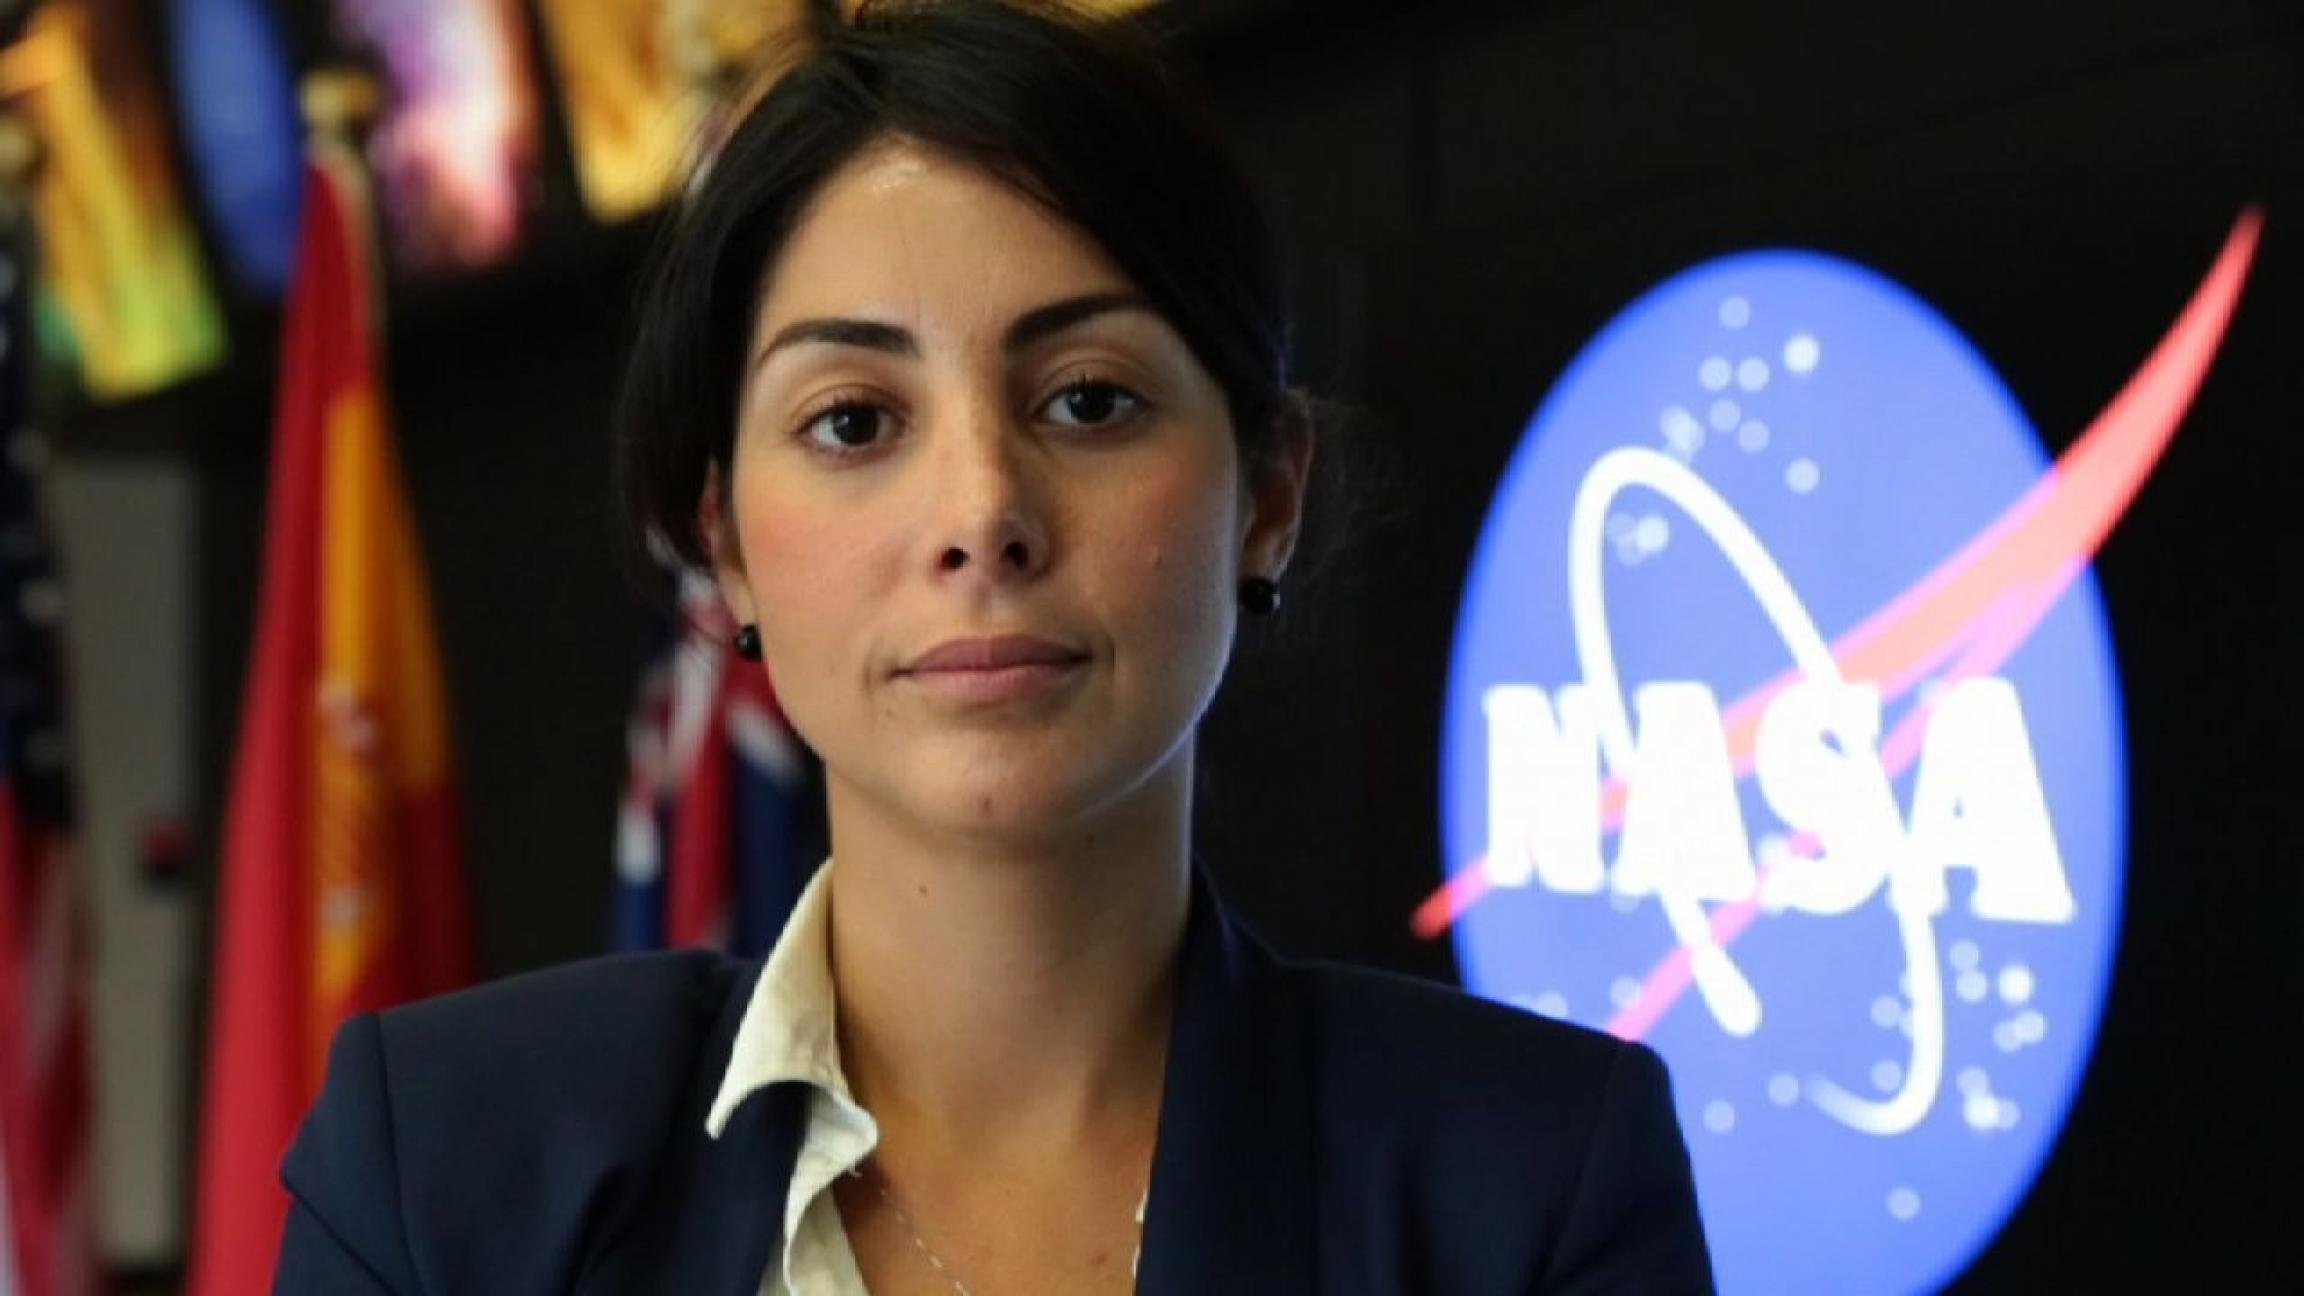 Diana Trujillo